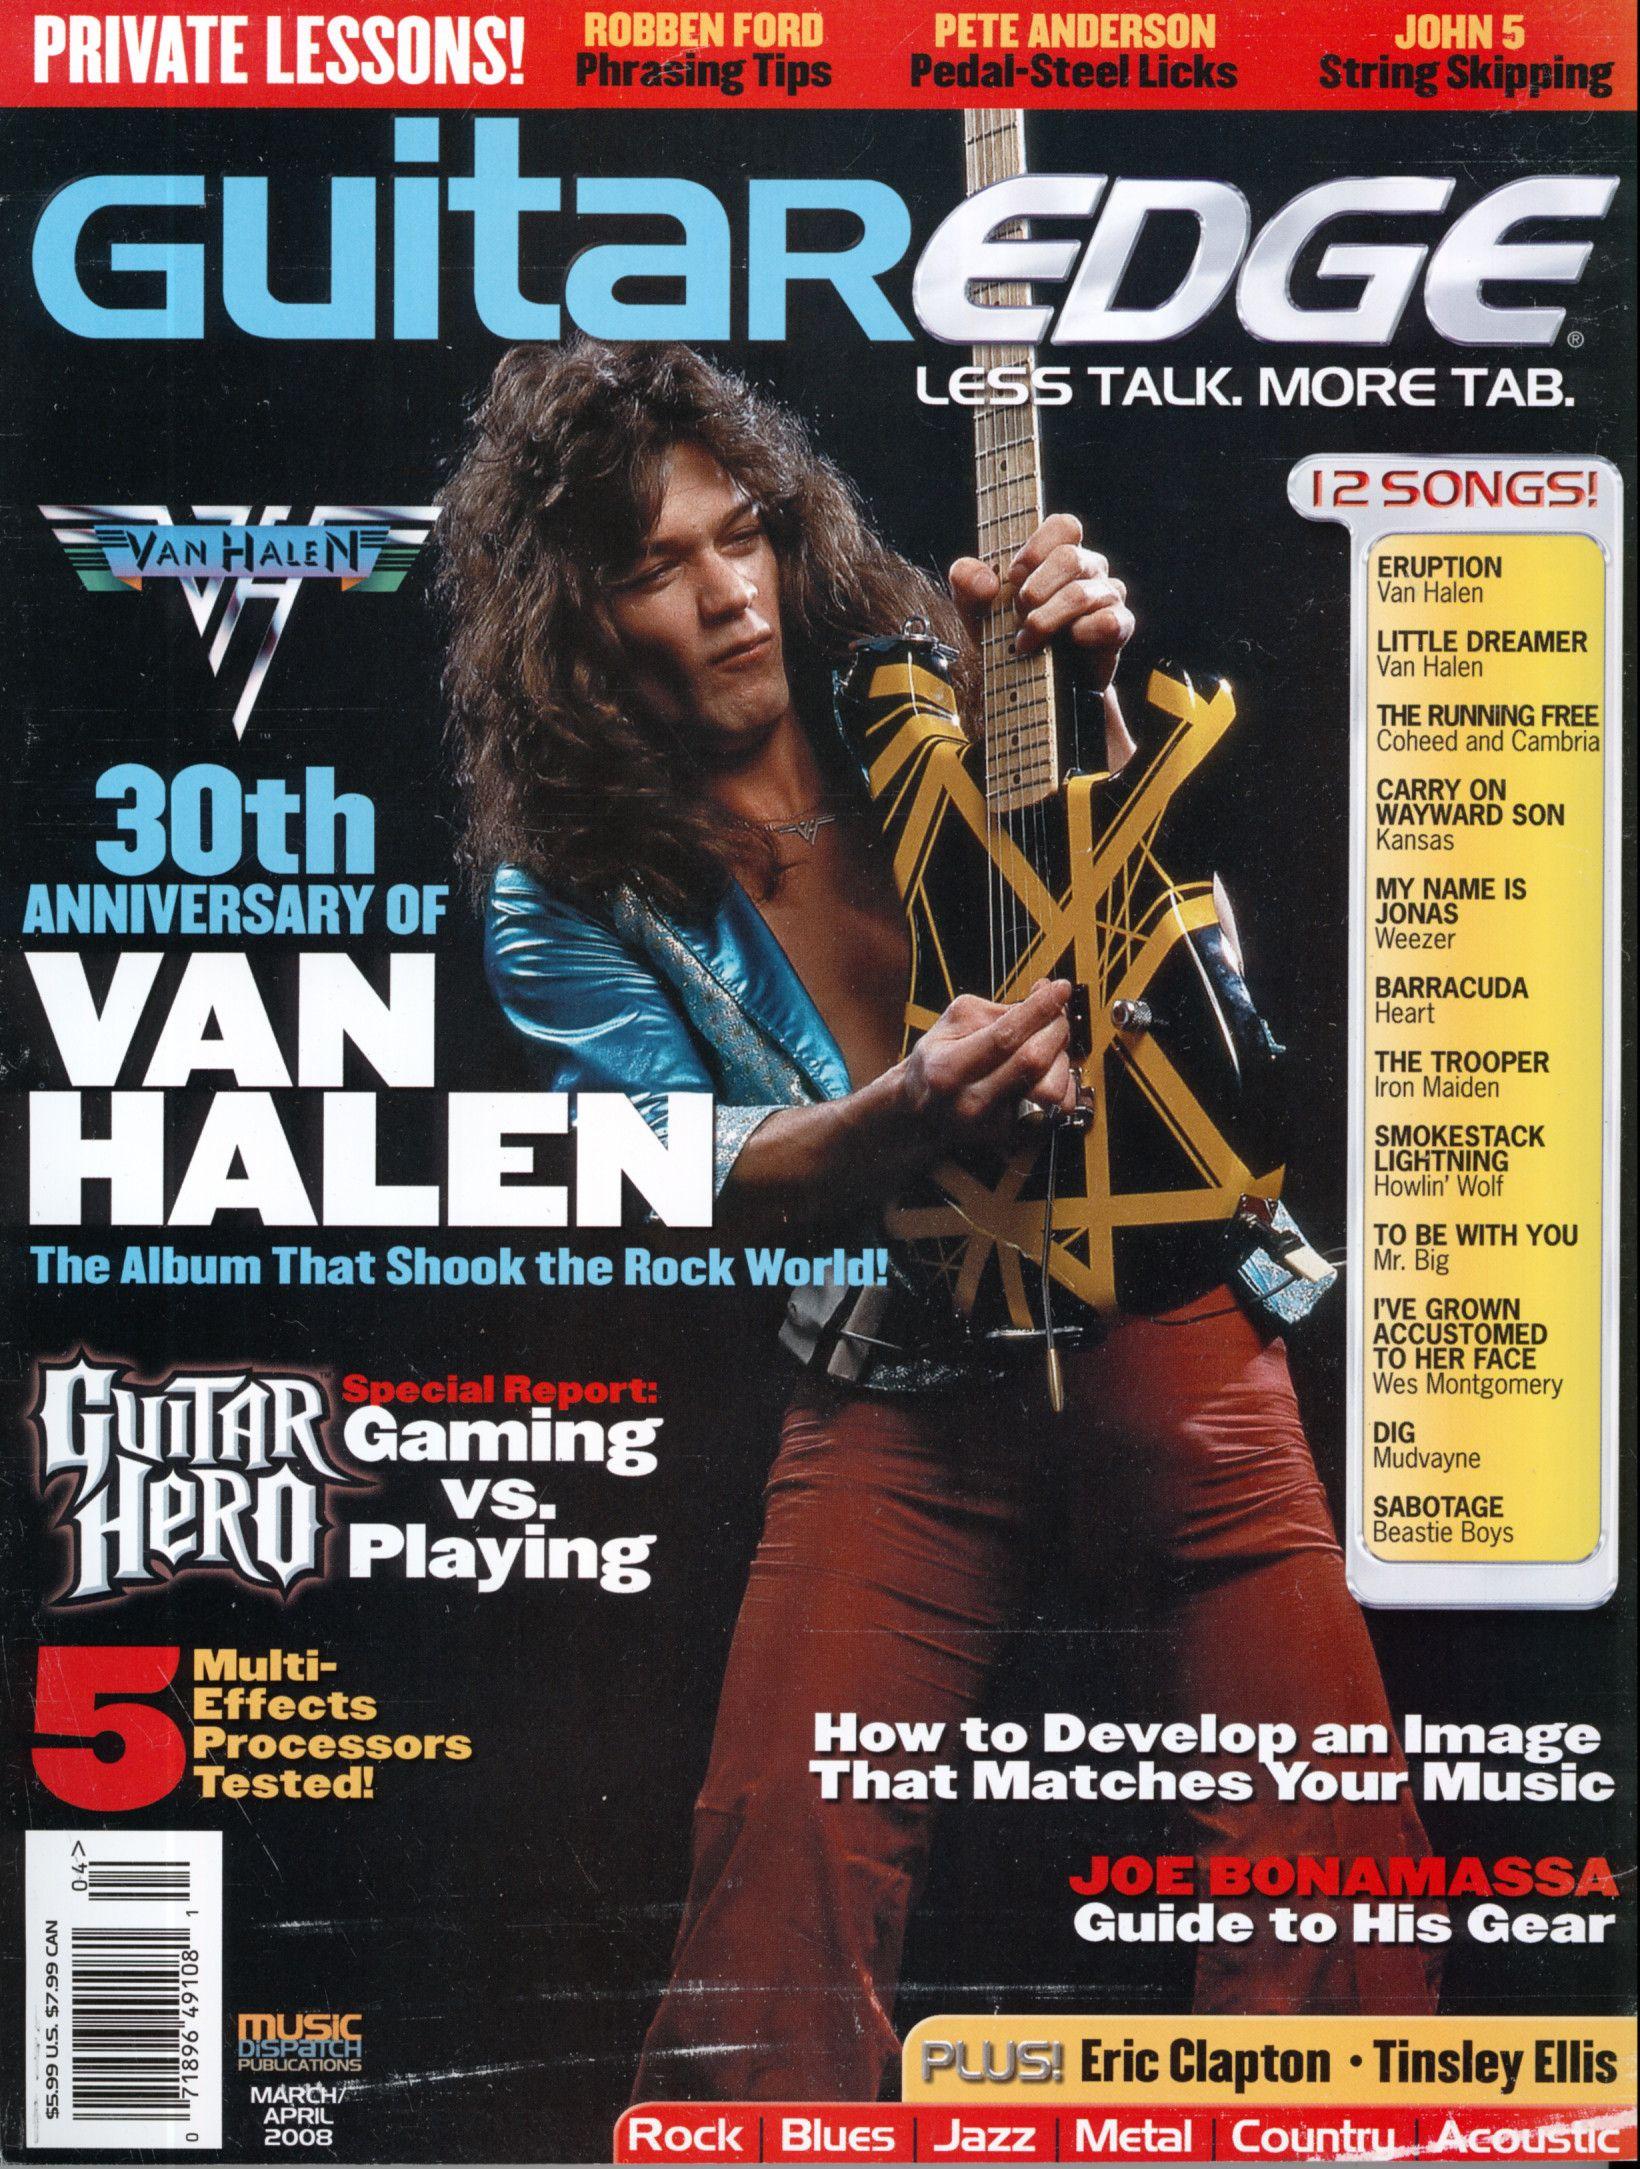 Pin By Chenchaone On Vh Eddie Van Halen Van Halen Coheed And Cambria